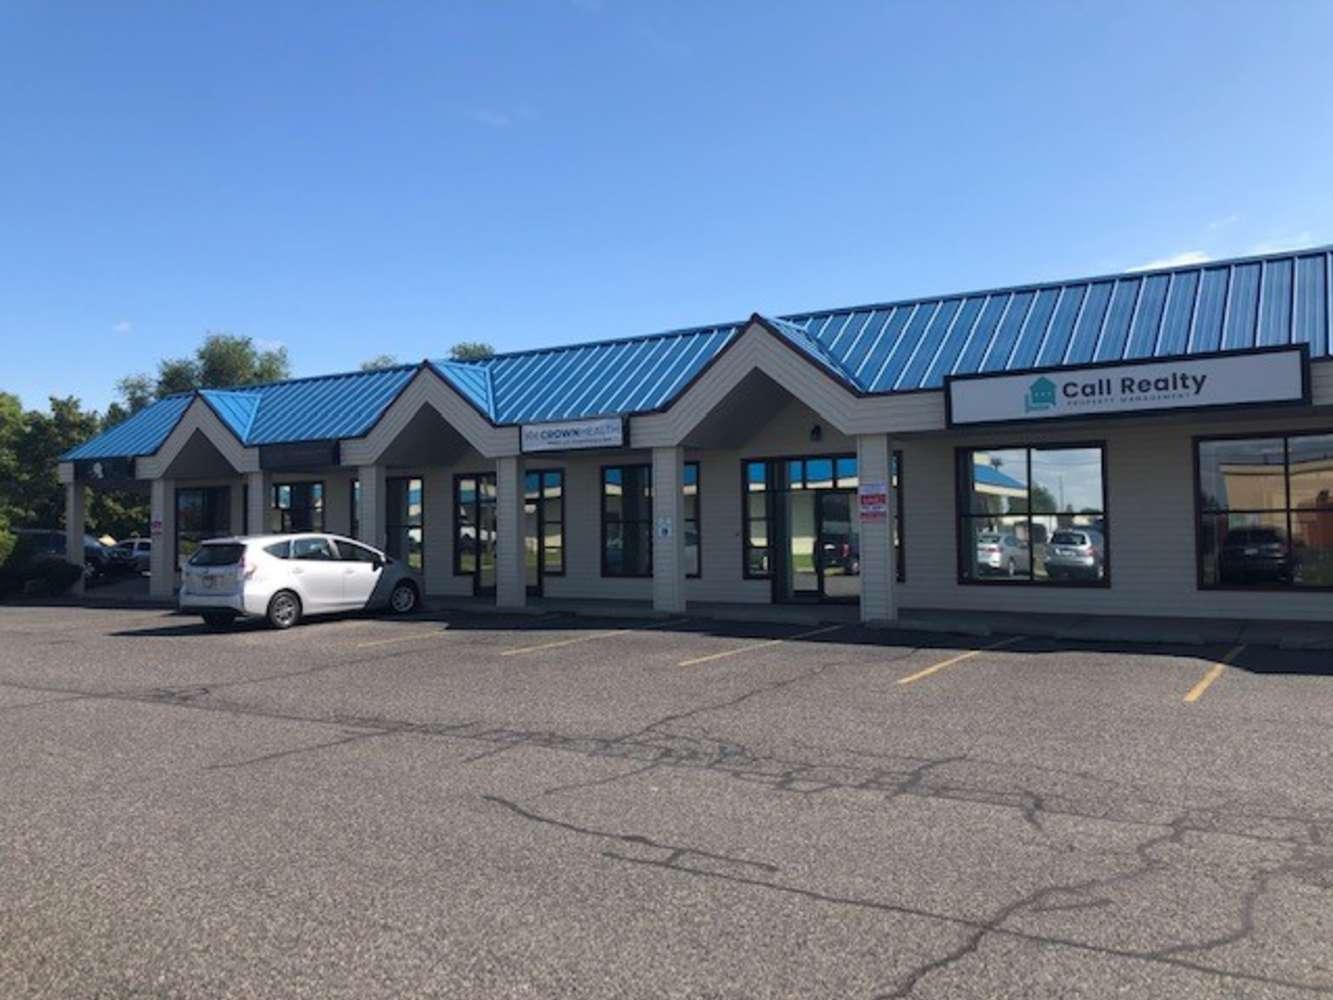 Retail Spokane valley, 99216 - 12623 E Sprague Avenue